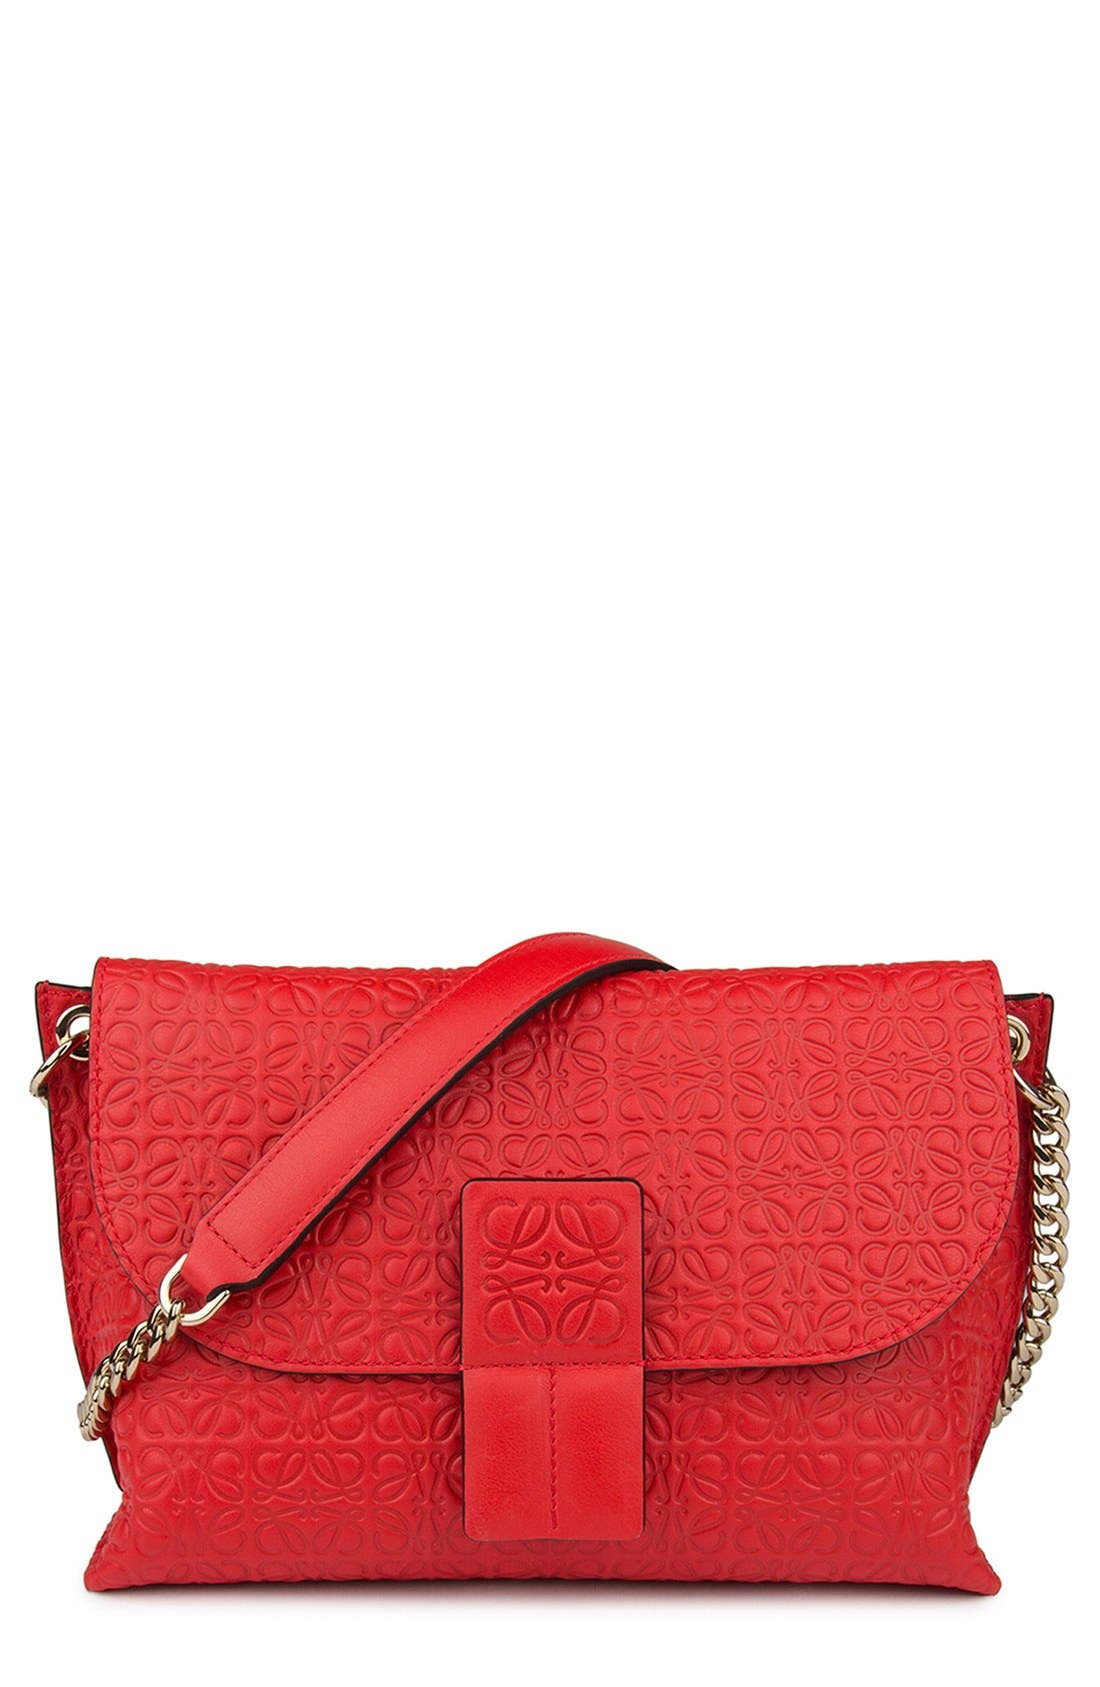 Alternate Image 1 Selected - Loewe 'Avenue' Embossed Calfskin Leather Crossbody Bag